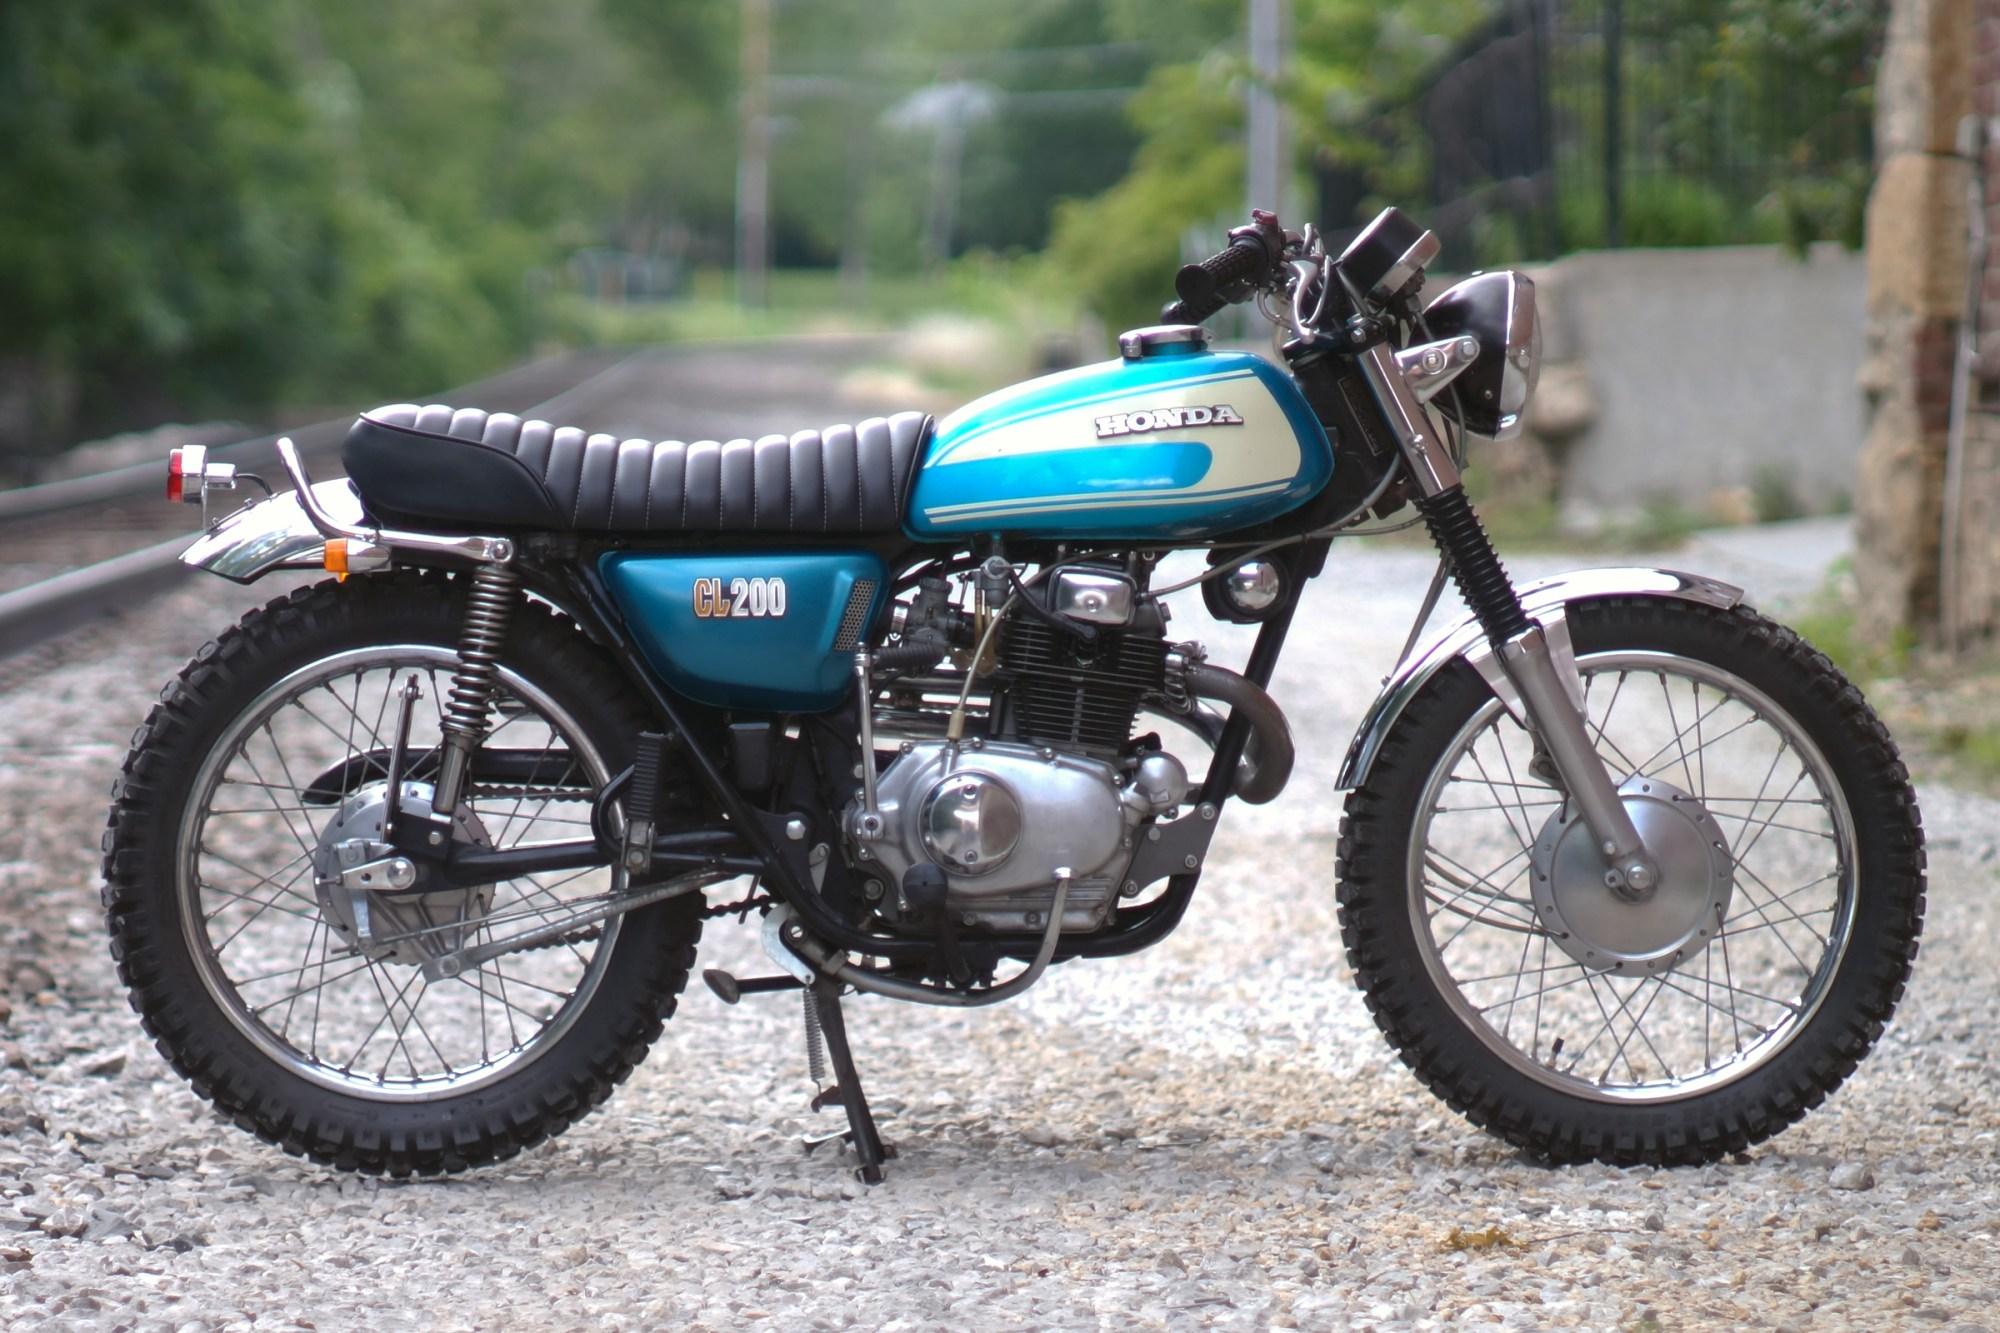 hight resolution of  honda cl200 custom cafe racer scrambler bratstyle tracker motorcycle 1974